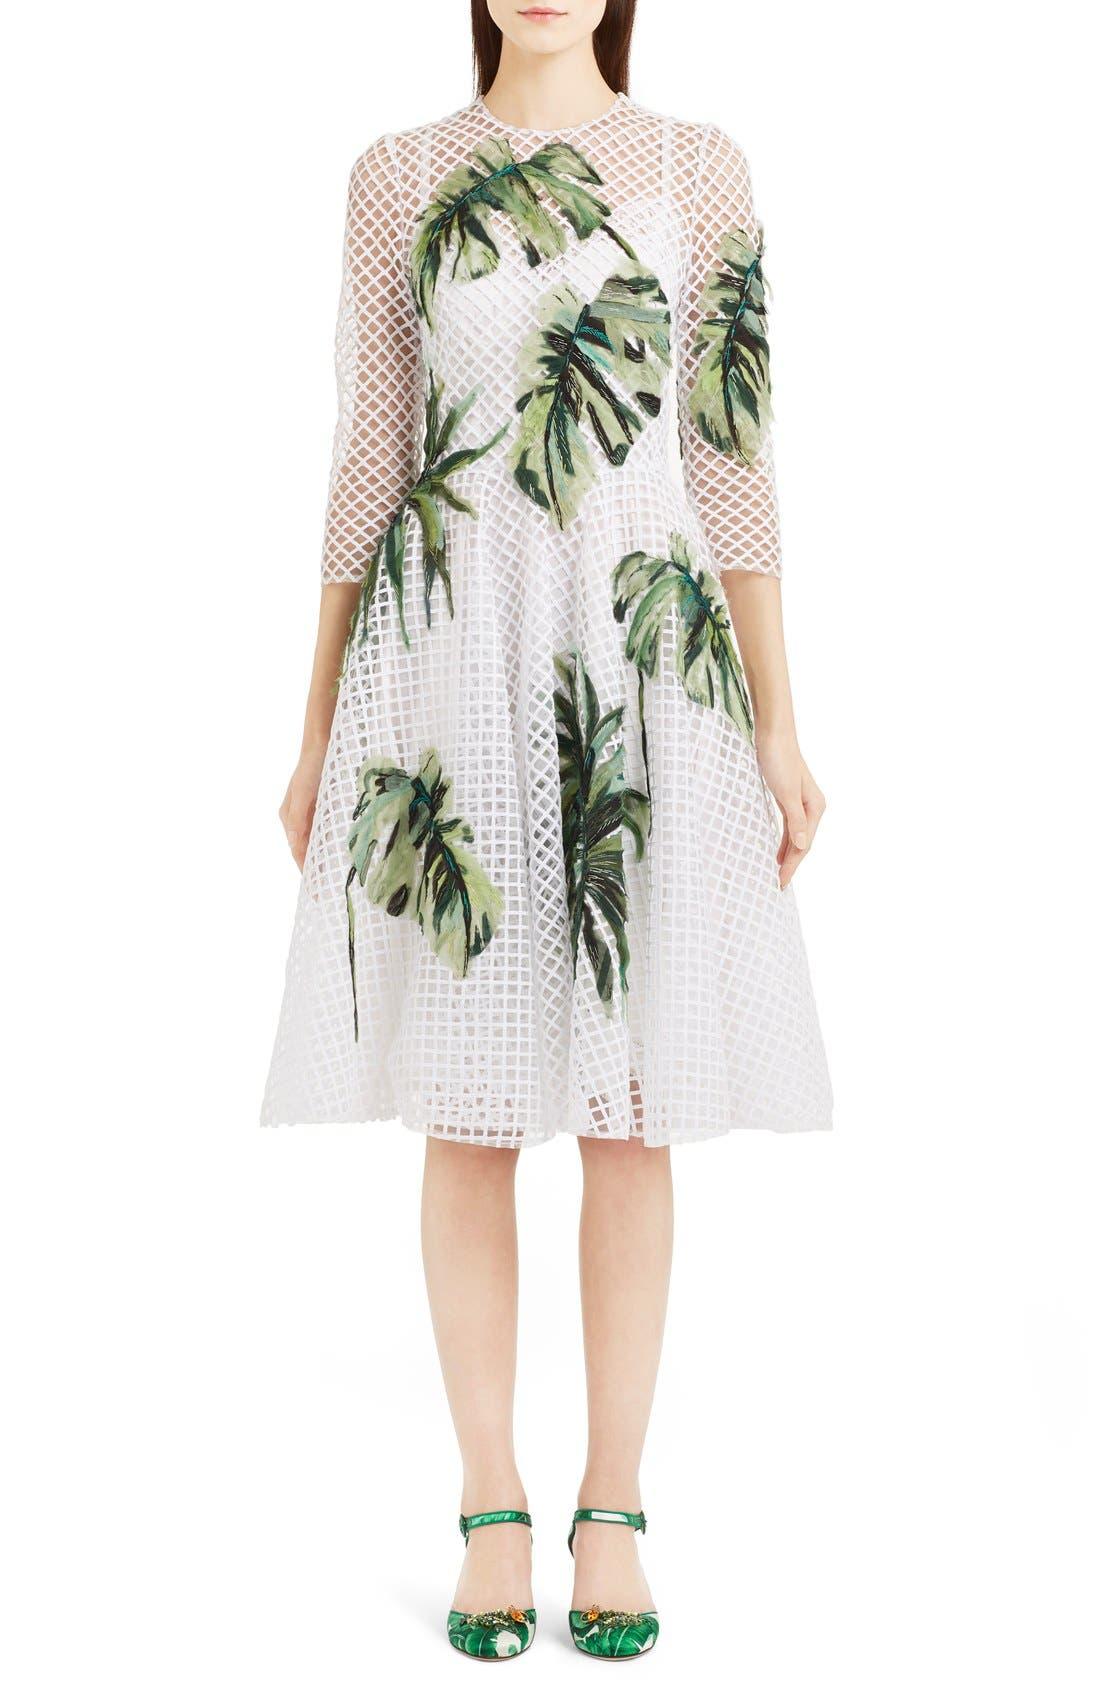 Alternate Image 1 Selected - Dolce&Gabbana Banana Leaf Embellished Mesh Lace Dress